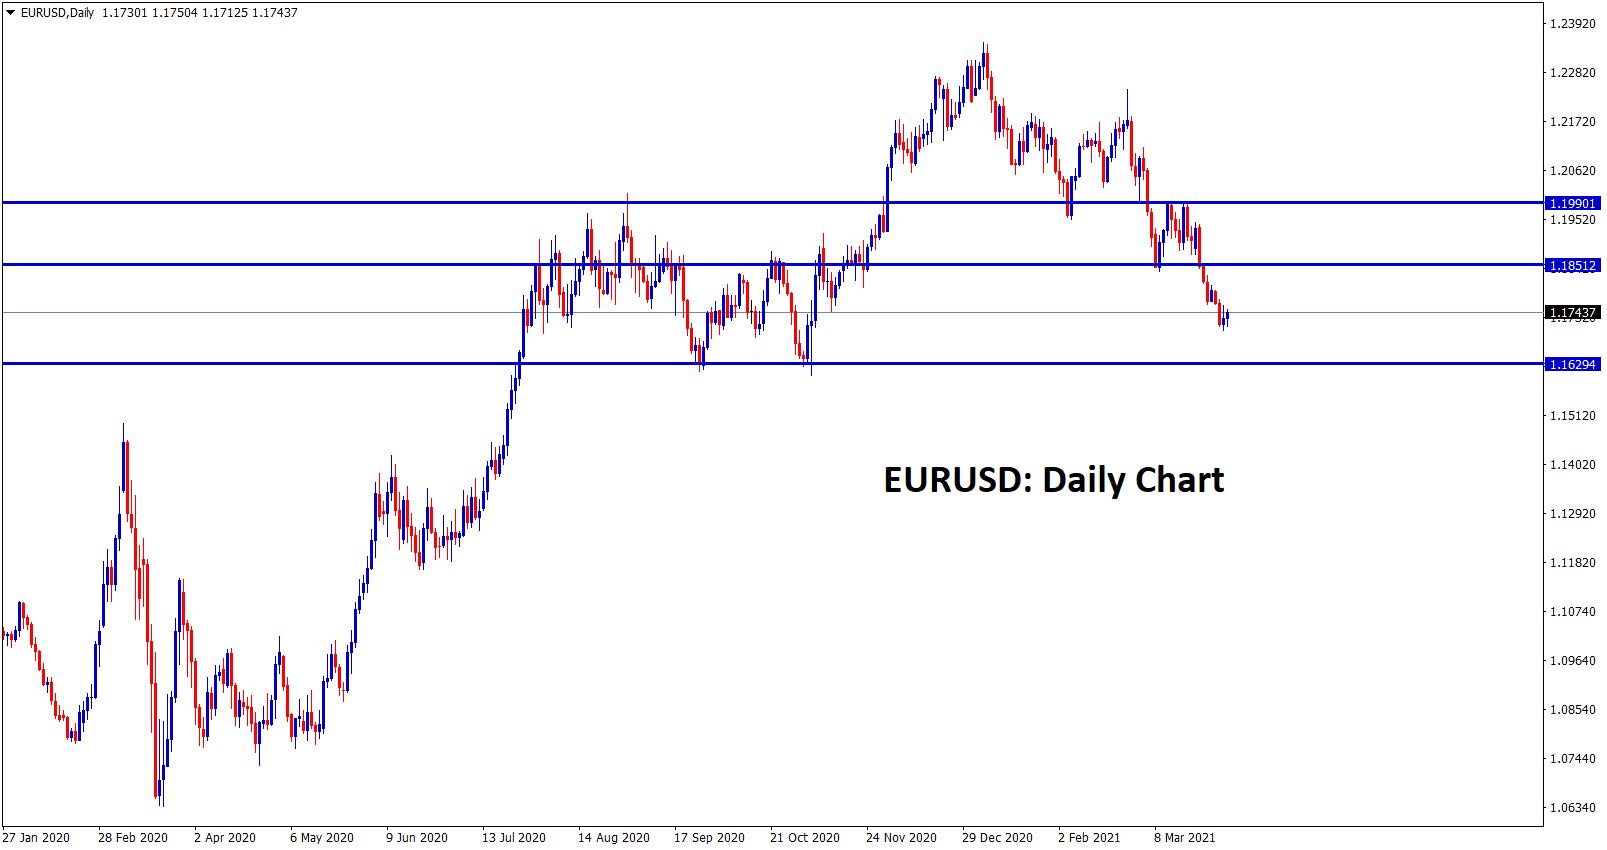 EURUSD Sr level ranging in daily chart